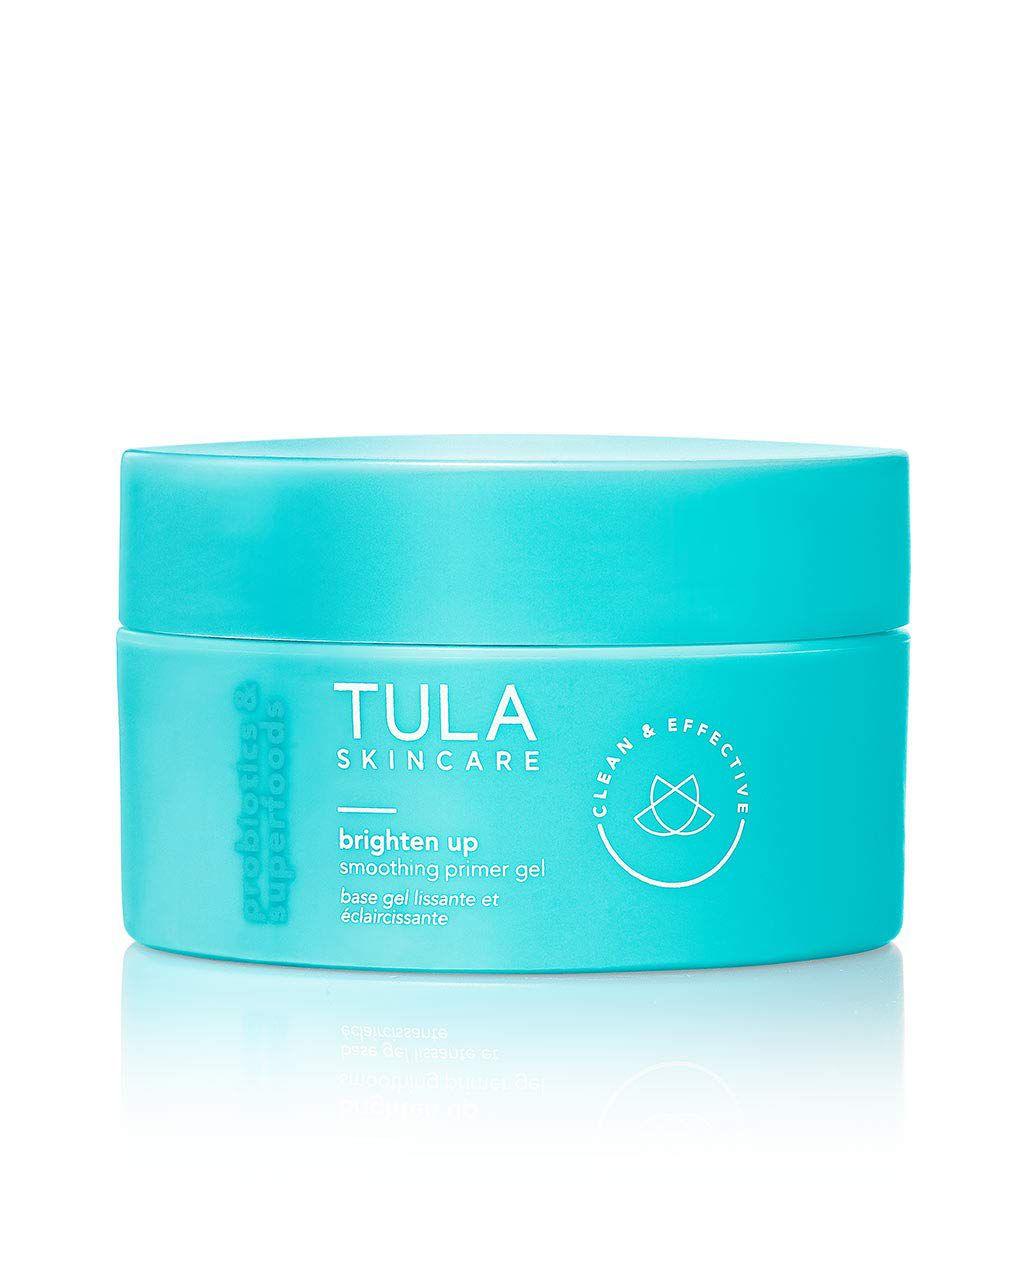 TULA Skincare Brighten Up Smoothing Primer Gel